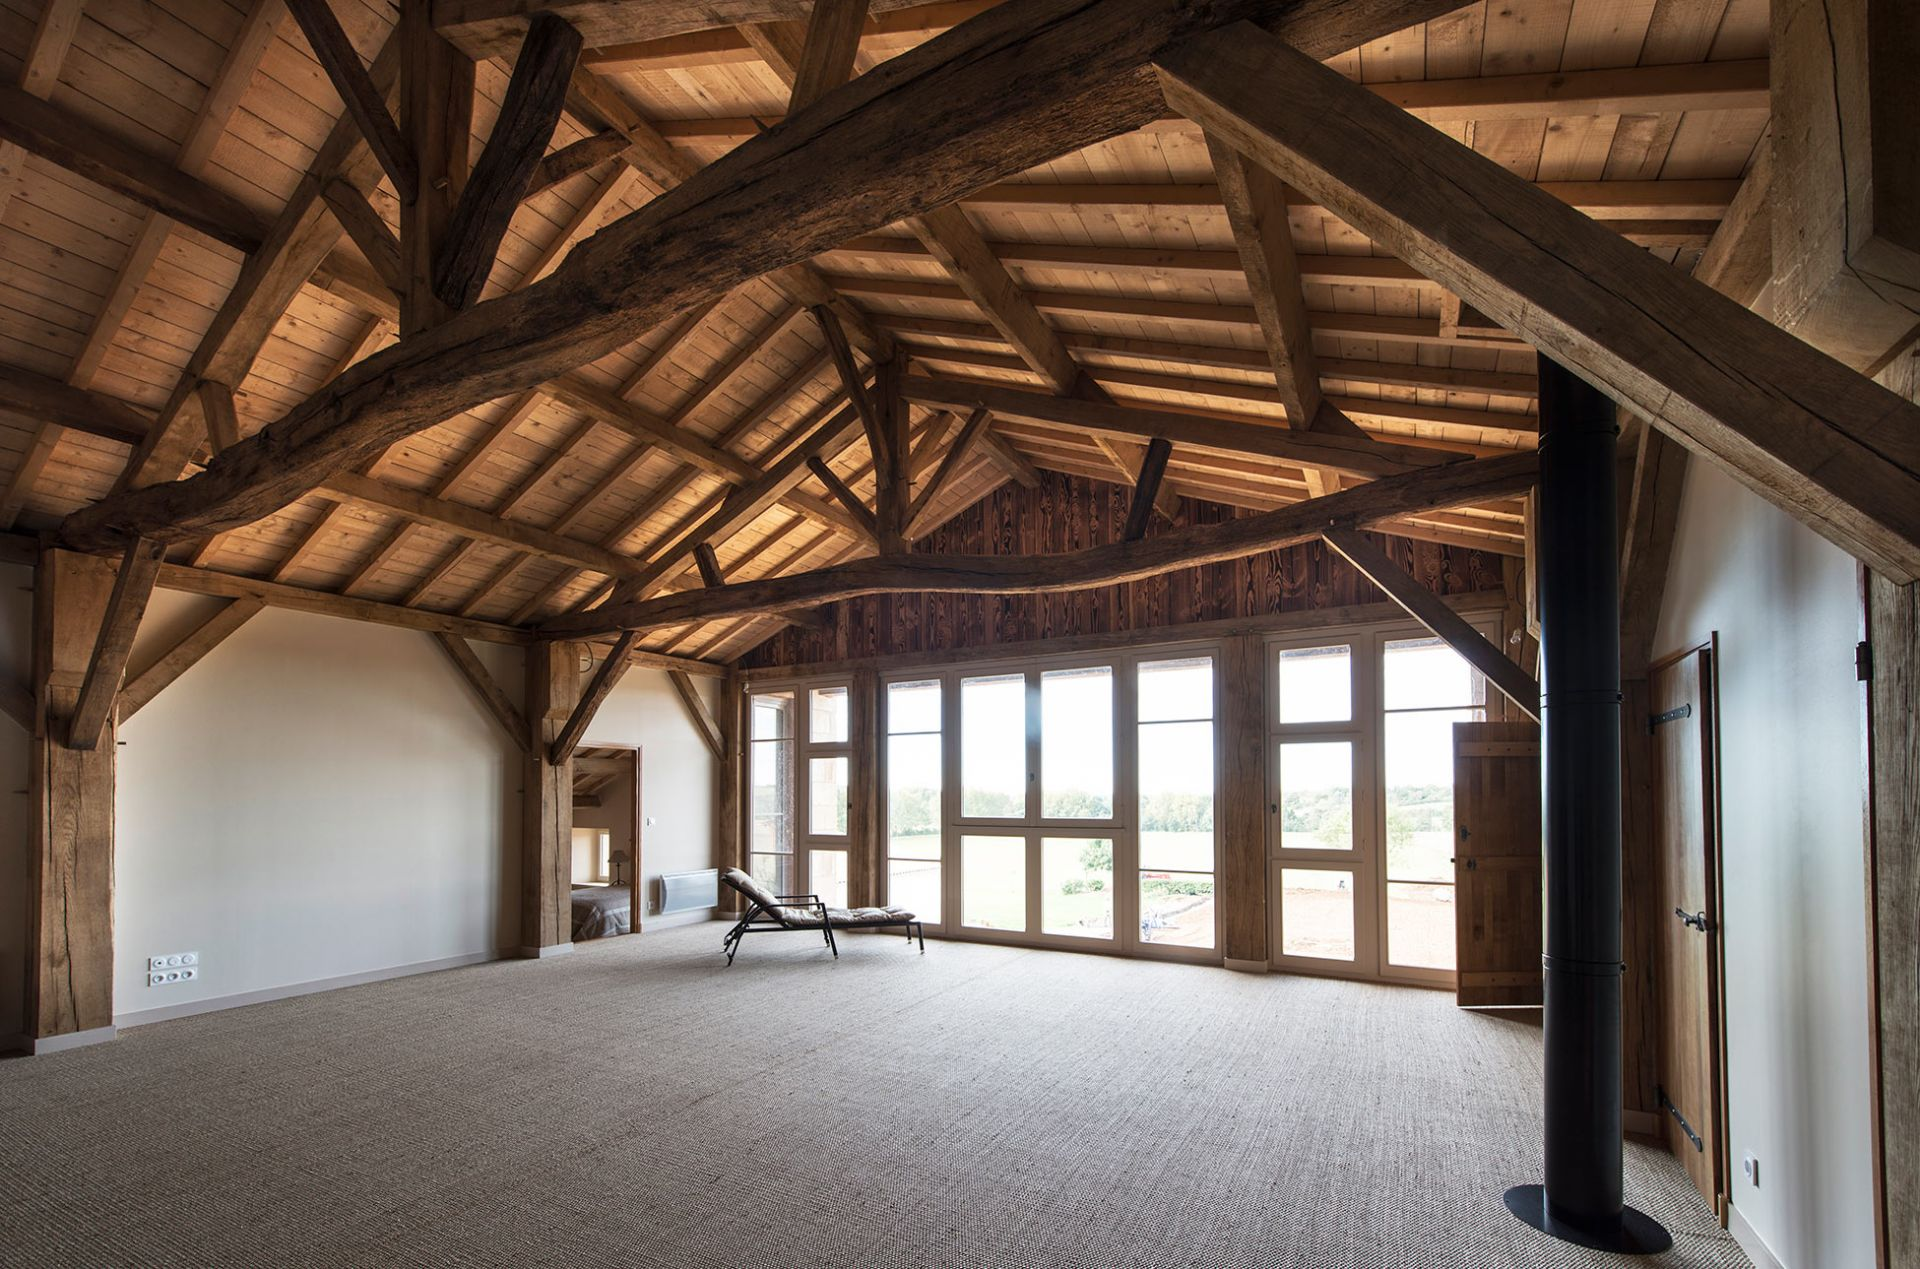 single project page architecture vend e. Black Bedroom Furniture Sets. Home Design Ideas